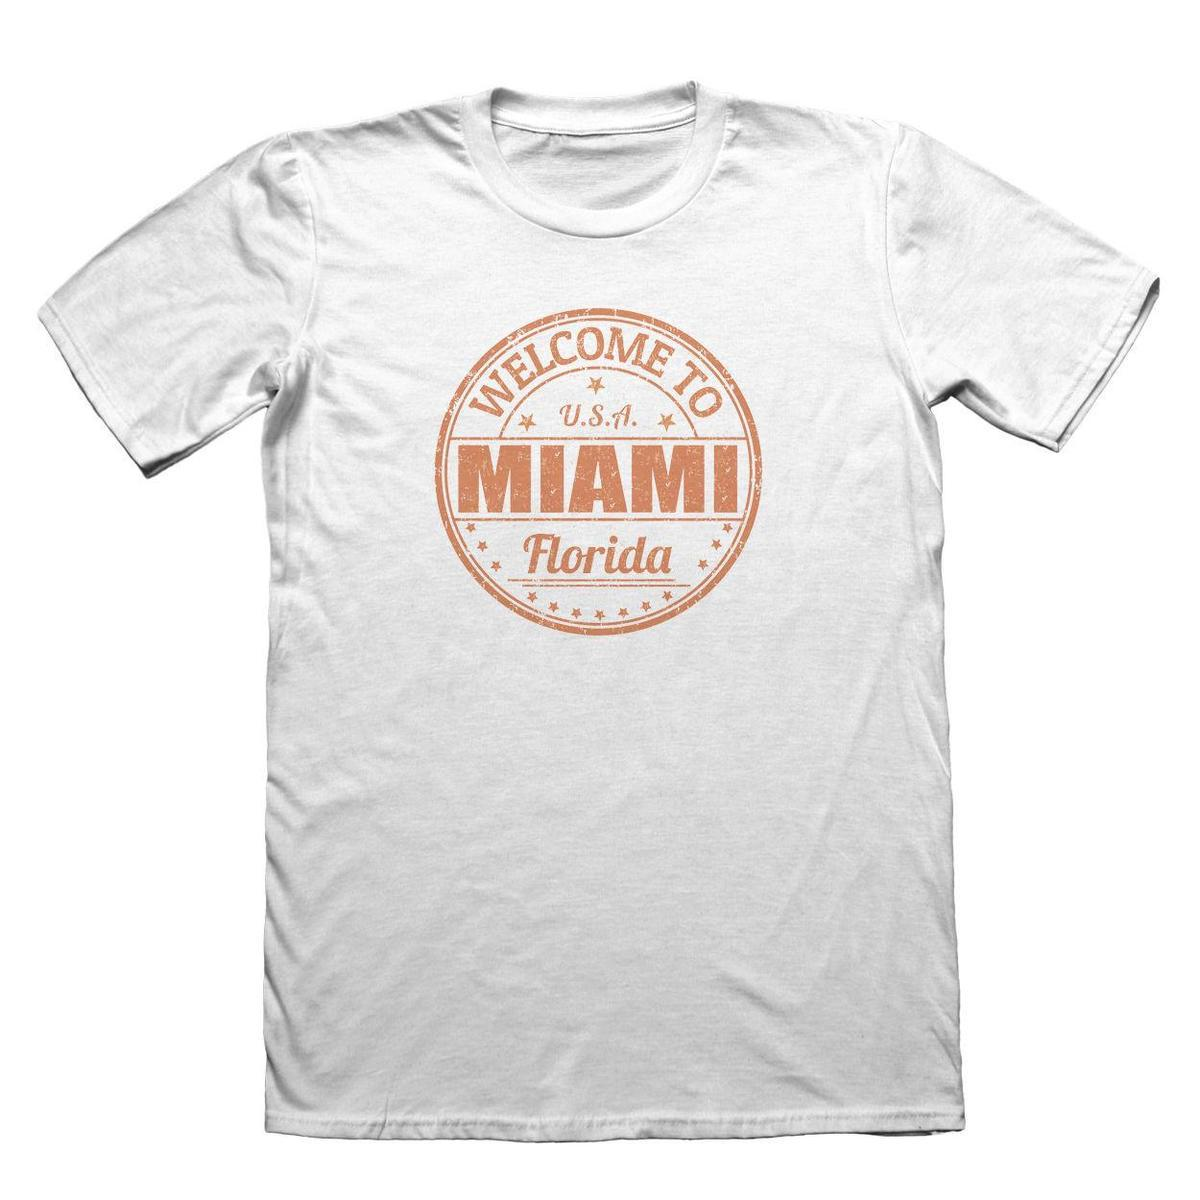 Miami Florida Usa Design T Shirt Funny Mens Gift 5219 Awesome T